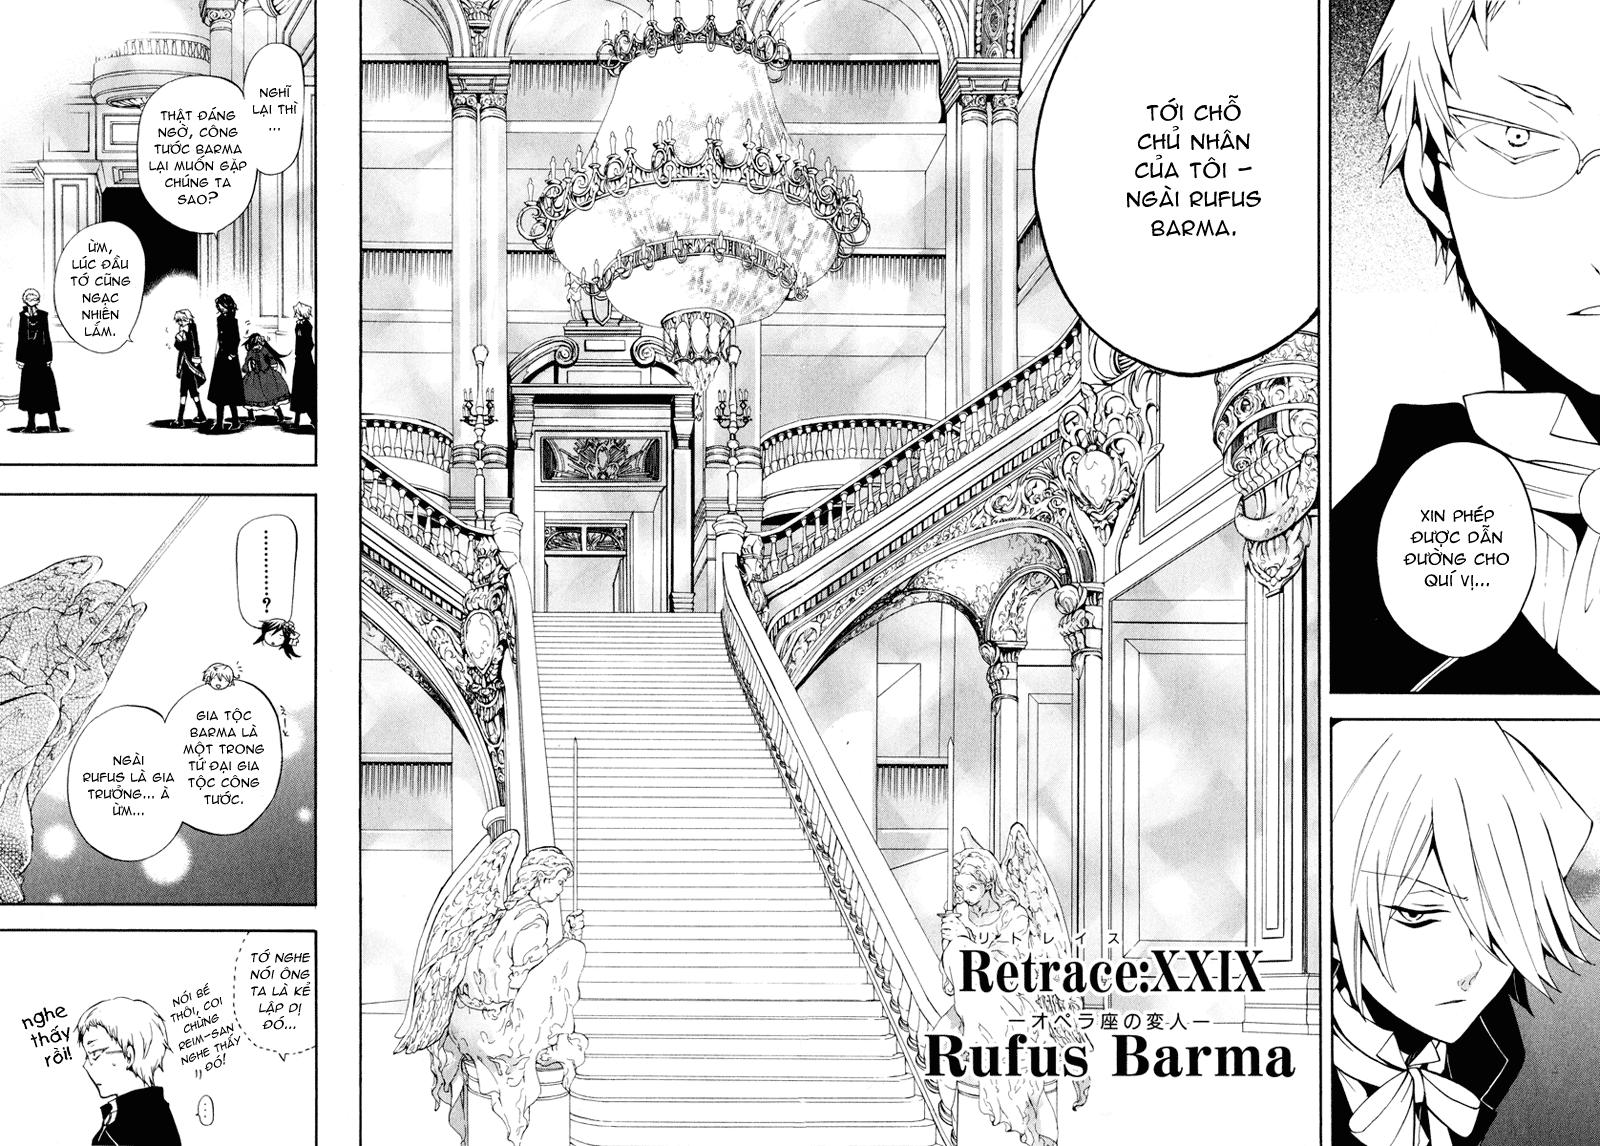 Pandora Hearts chương 029 - retrace: xxxix rufus=barma trang 3